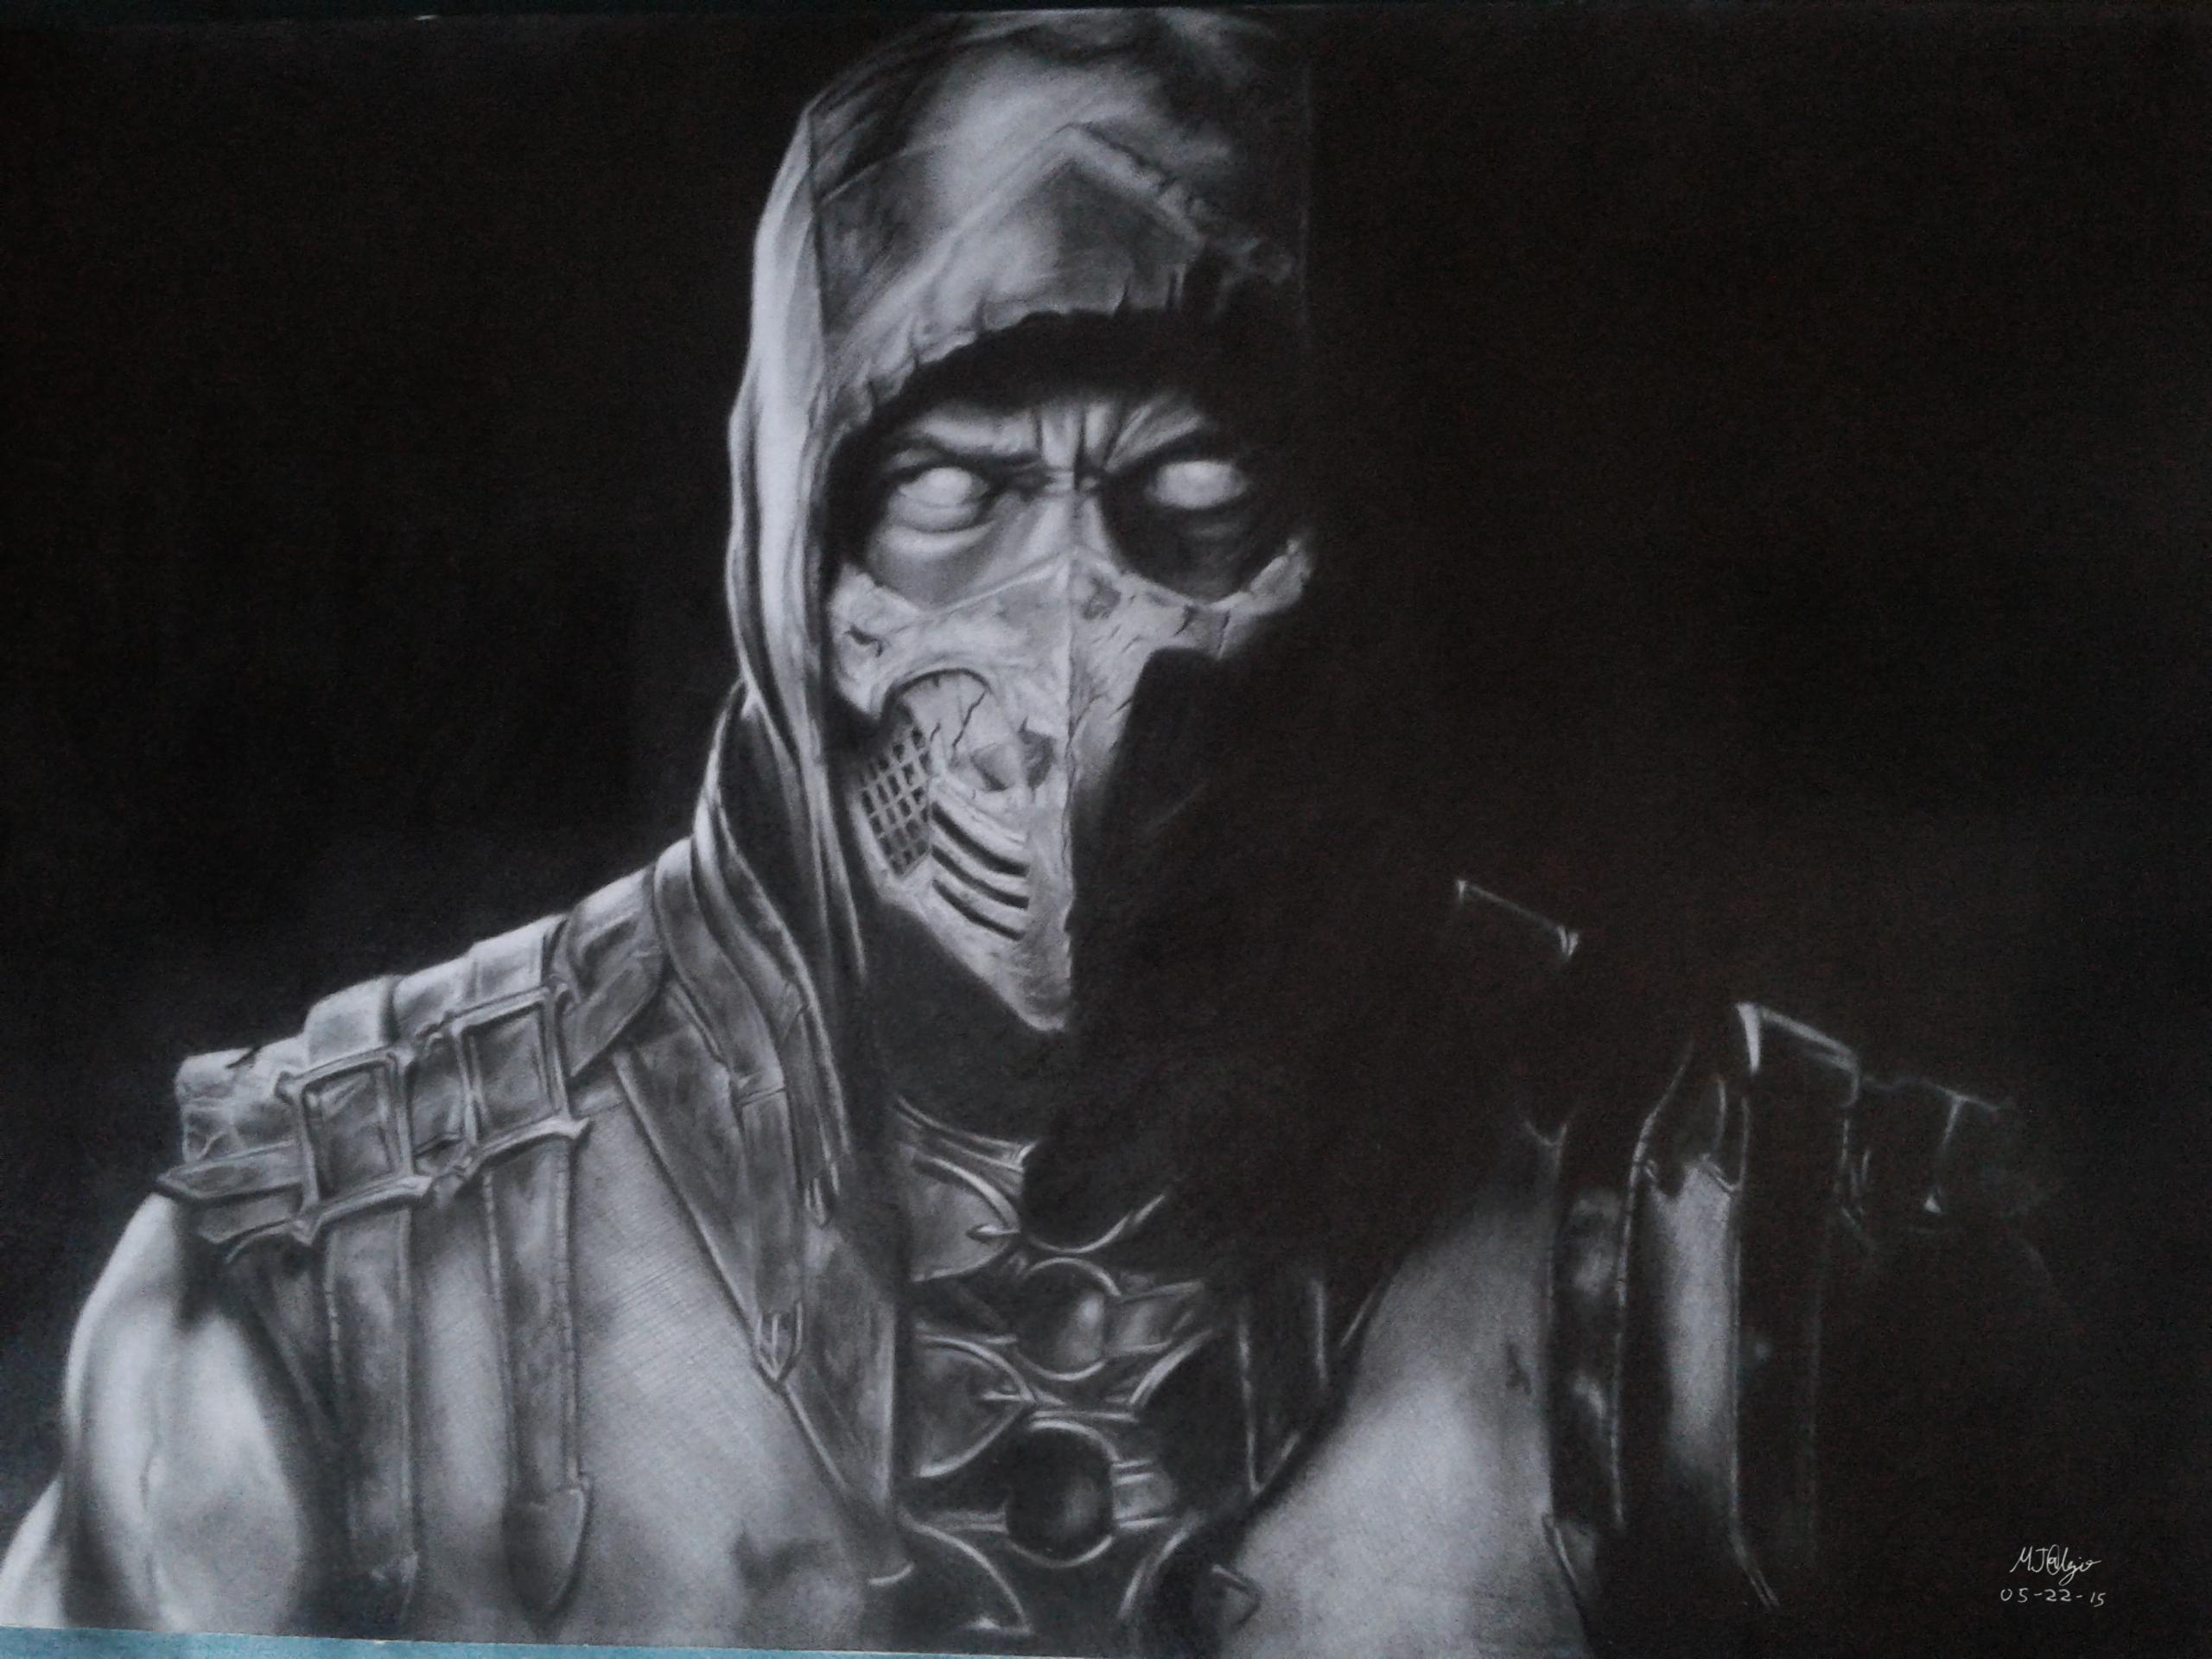 Mortal Kombat X Scorpion Drawing By Tremor209 On Deviantart